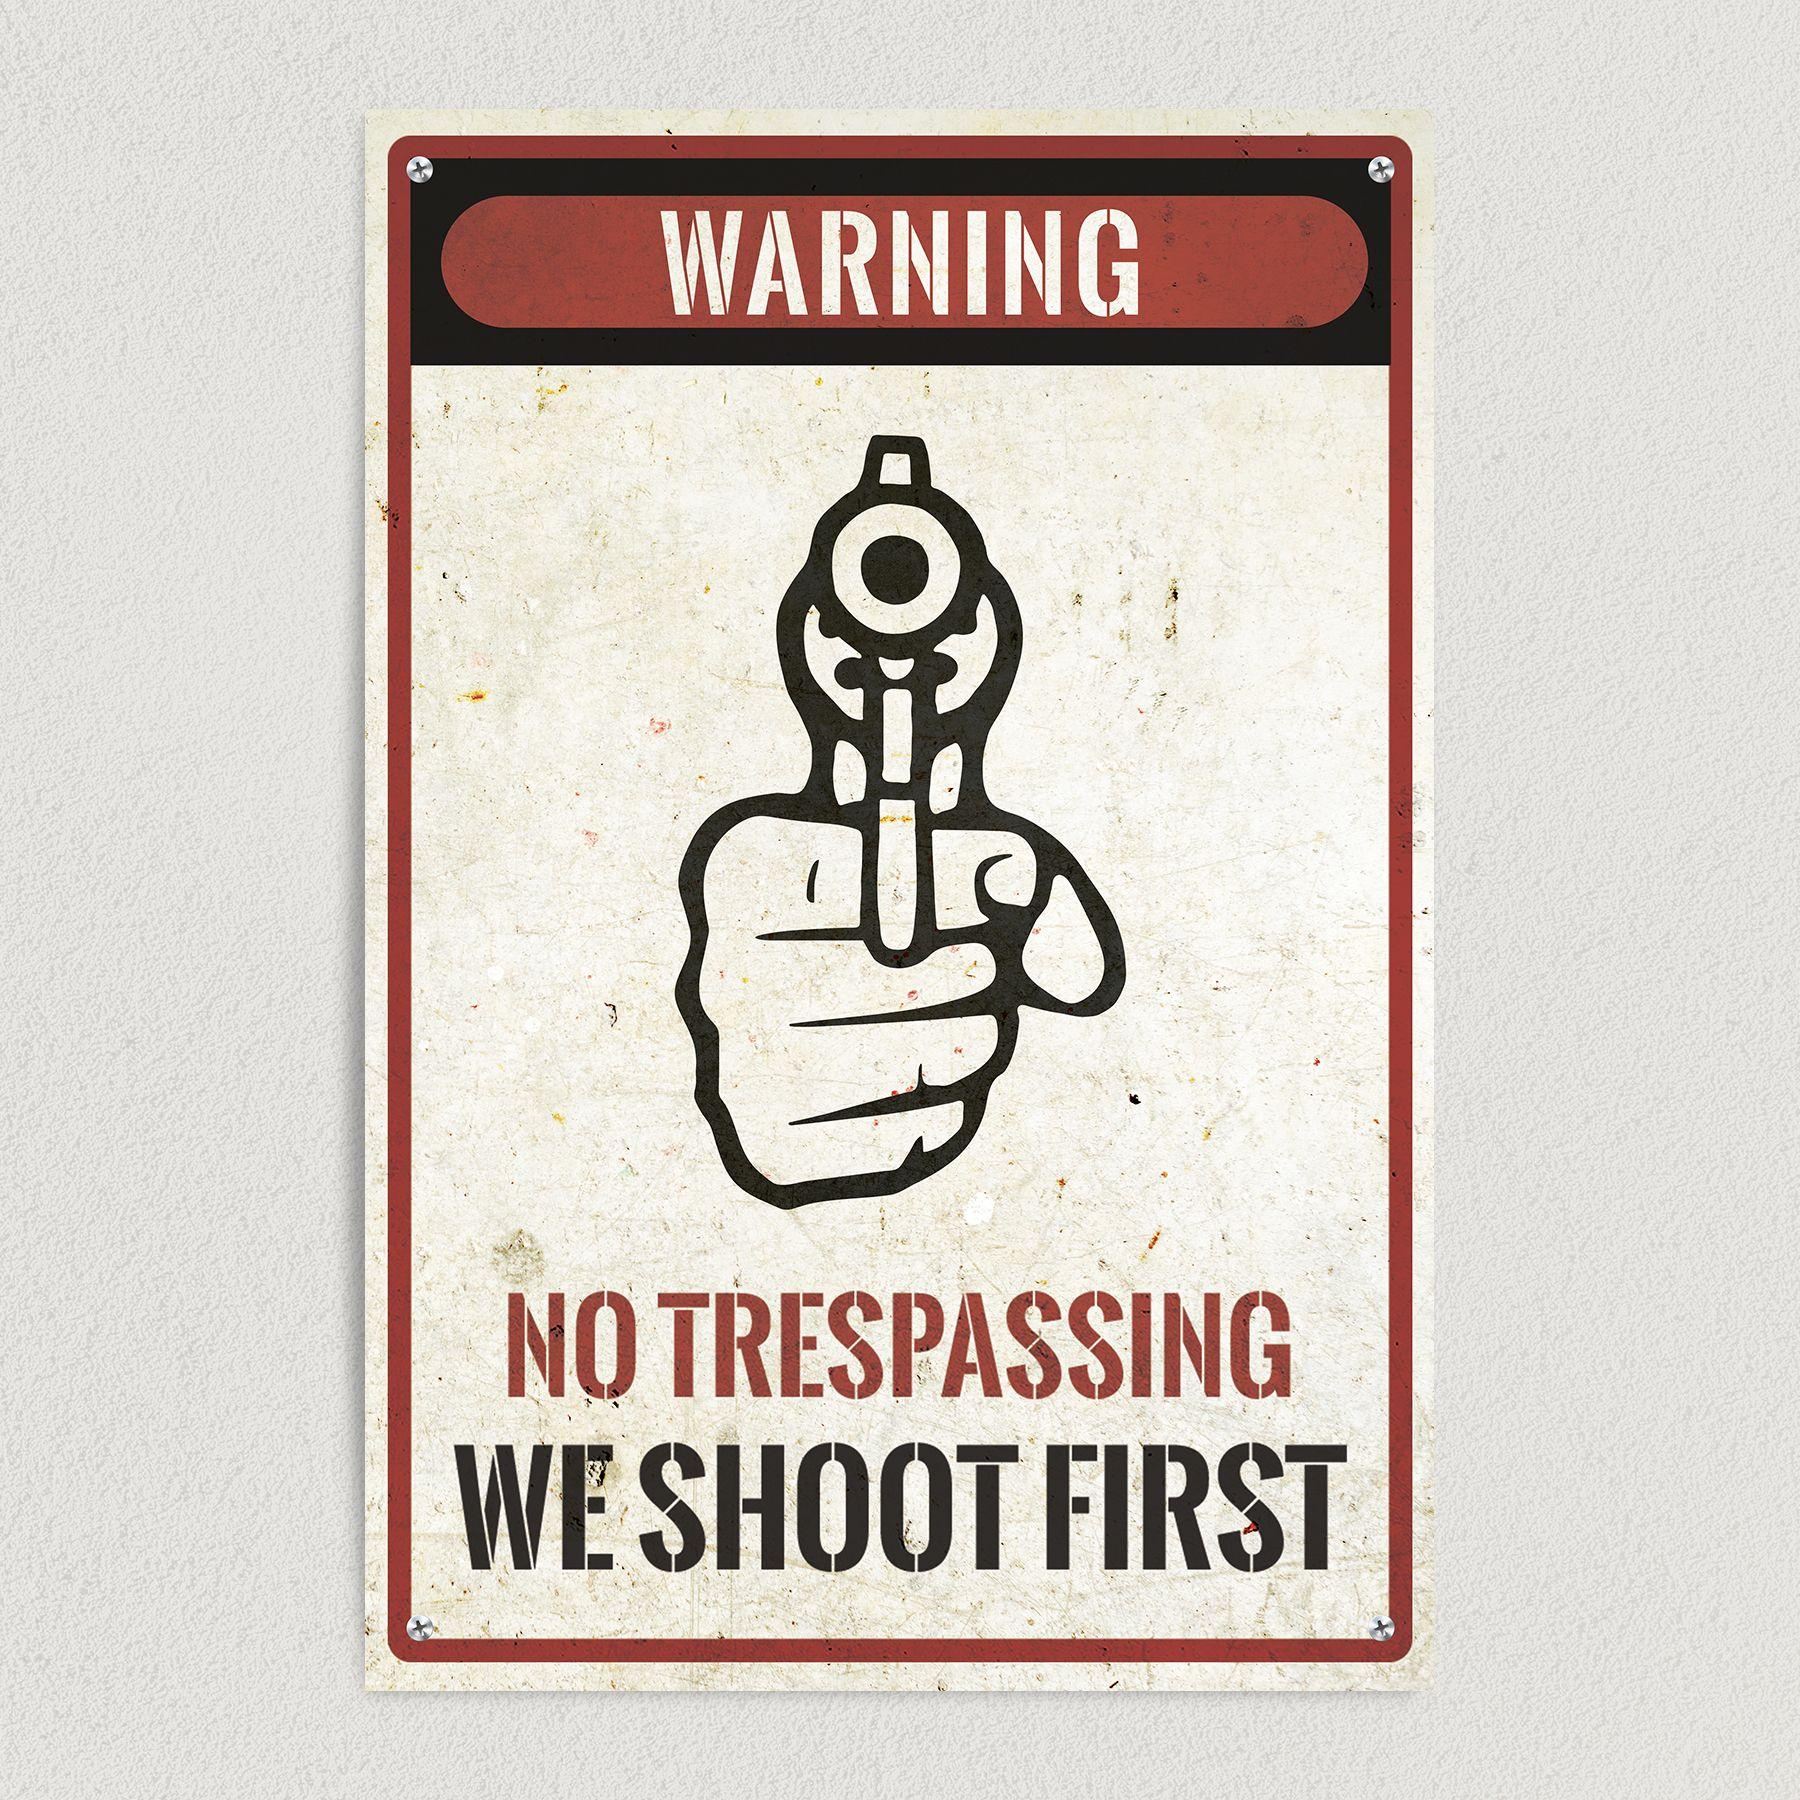 No Trespassing Warning We Shoot First Art Print Poster 12″ x 18″ Wall Art WS1000